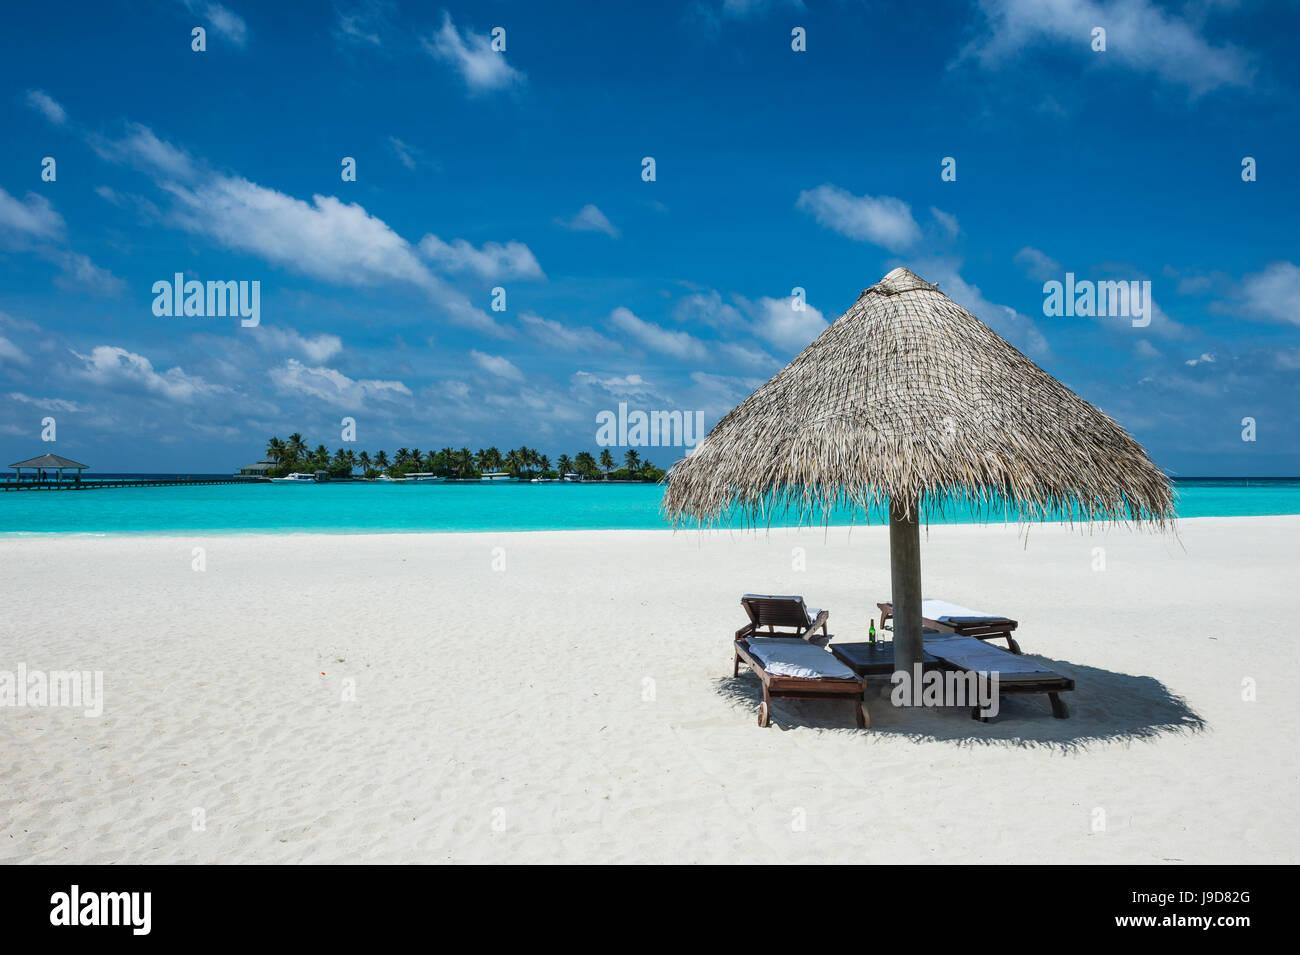 Parasol on a white sand beach and turquoise water, Sun Island Resort, Nalaguraidhoo island, Ari atoll, Maldives, - Stock Image